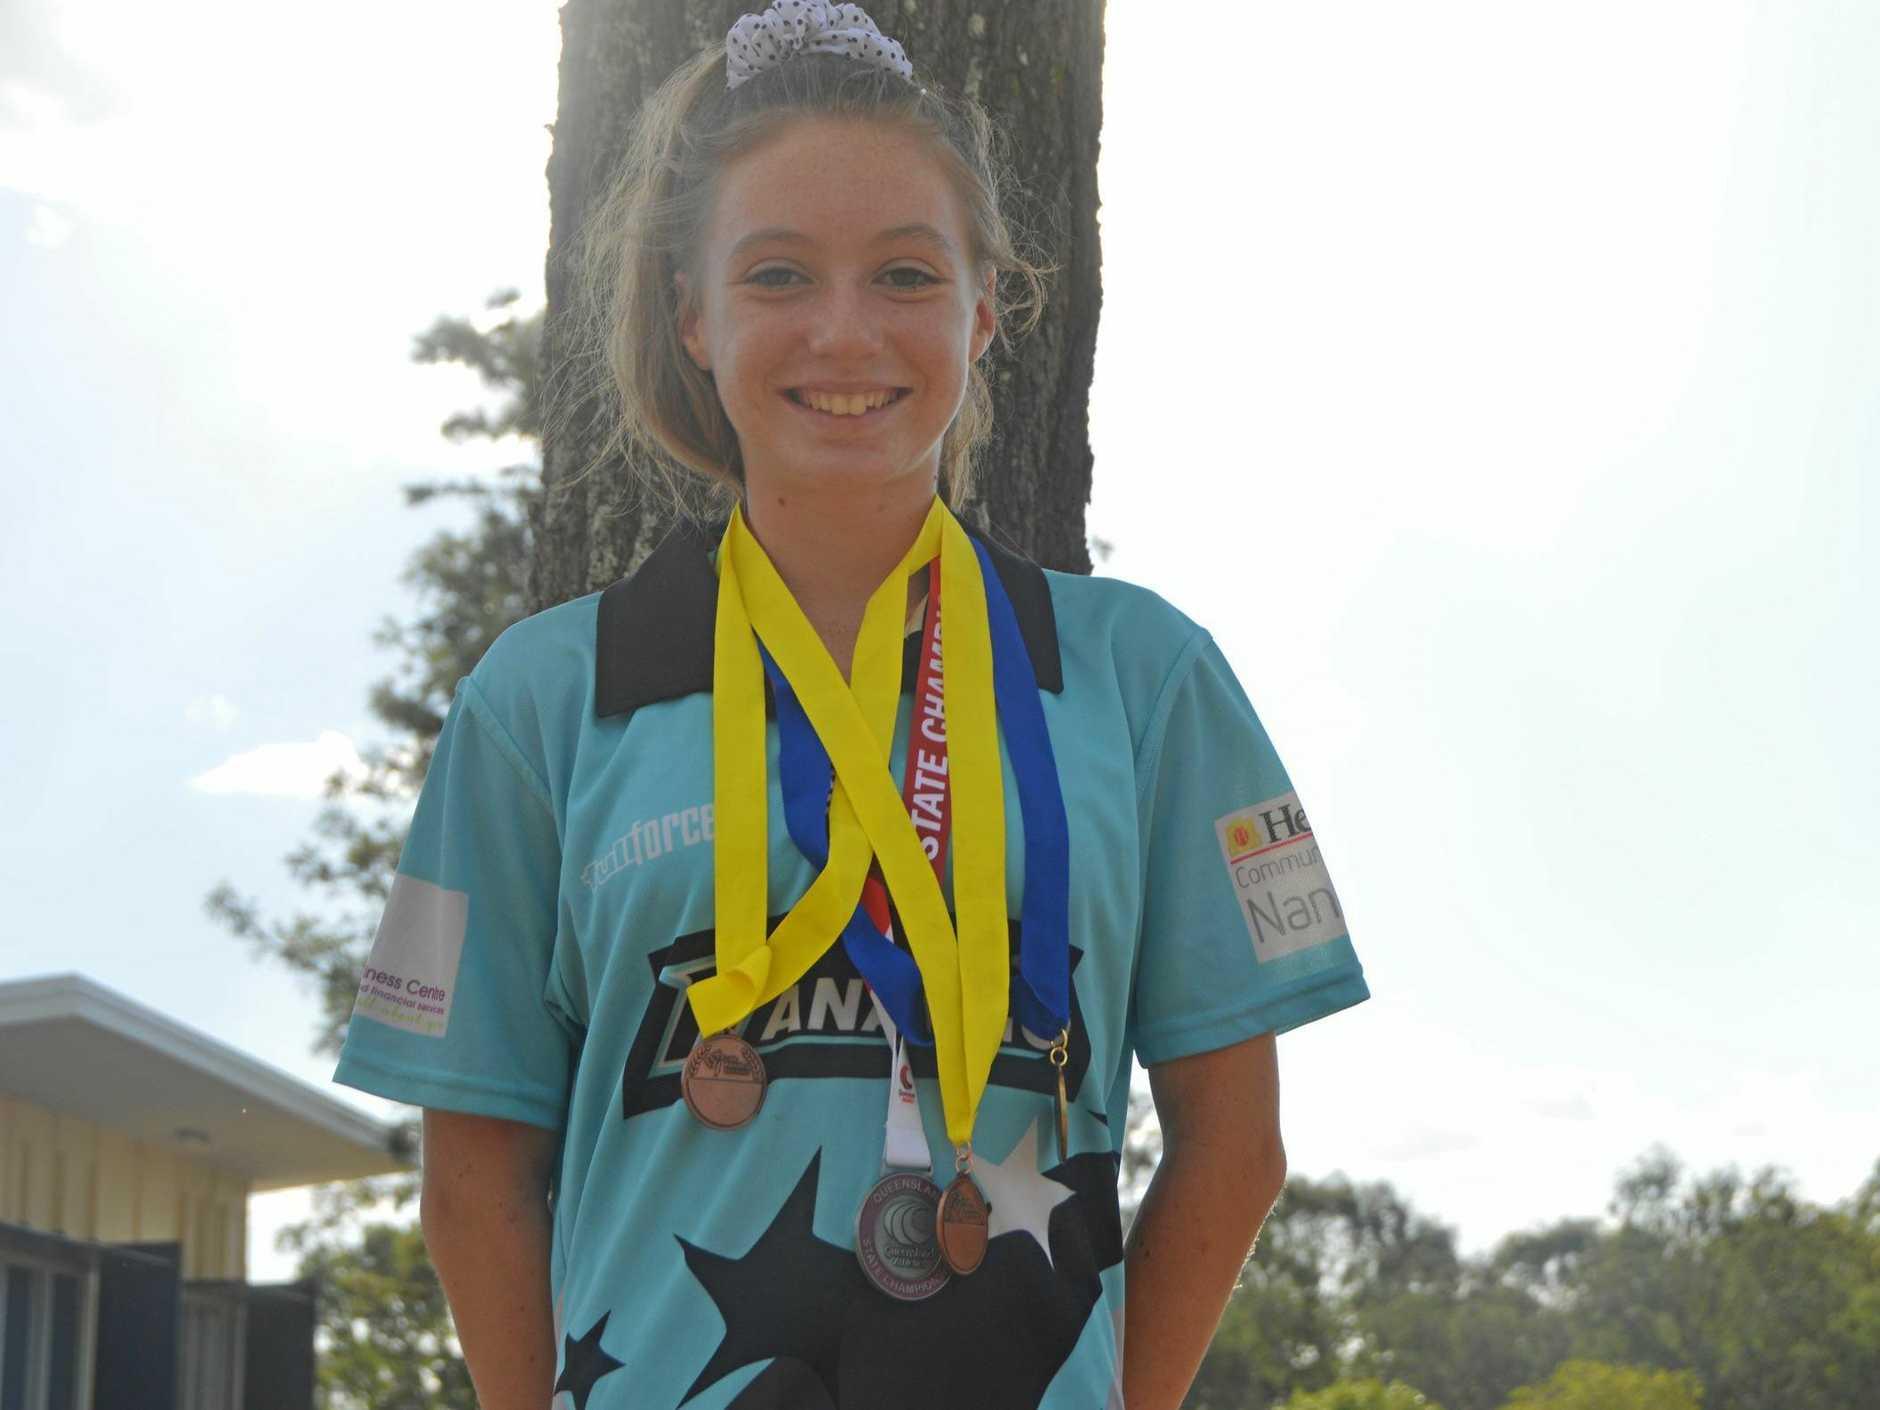 BIG GOALS: Summer Millard has big goals in race walking.